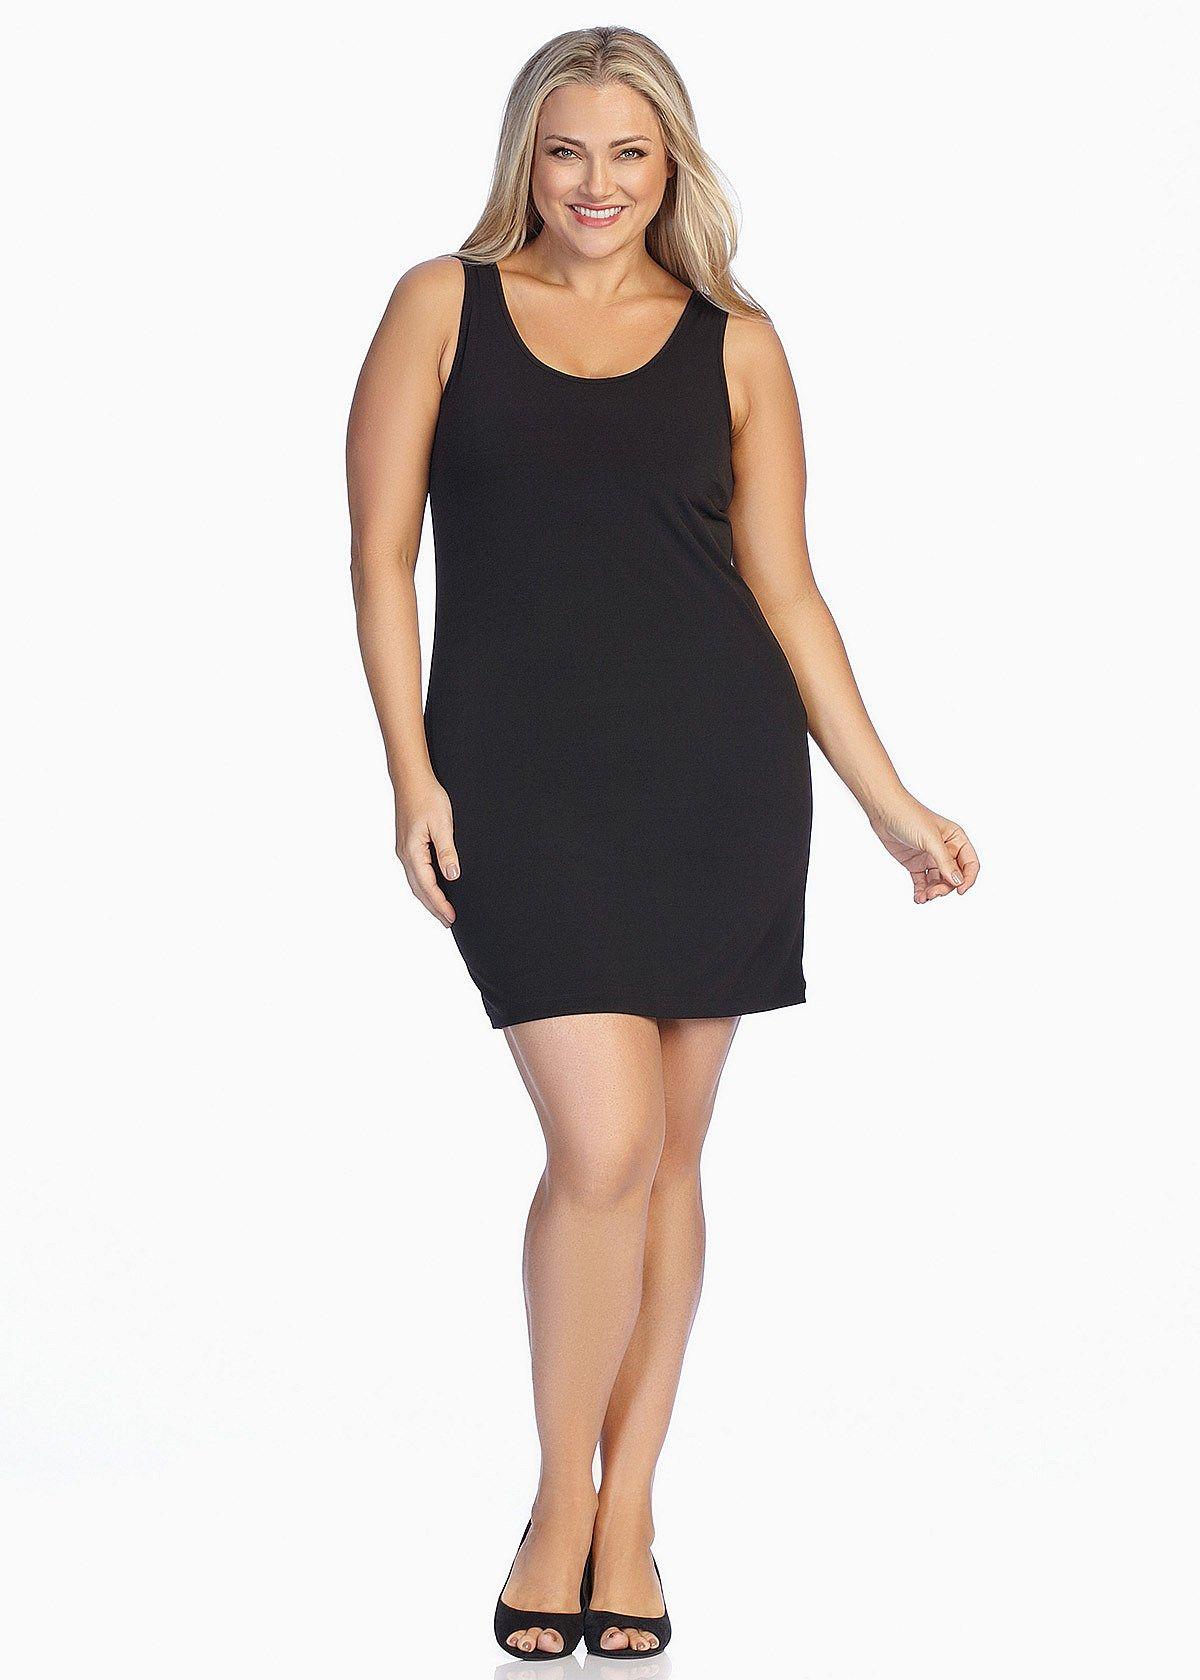 Plus Size Dresses Online In Australia Taking Shape Luna Base Slip Body Dres Plus Size Womens Clothing Plus Size Vintage Dresses Plus Size Fashion For Women [ 1680 x 1200 Pixel ]